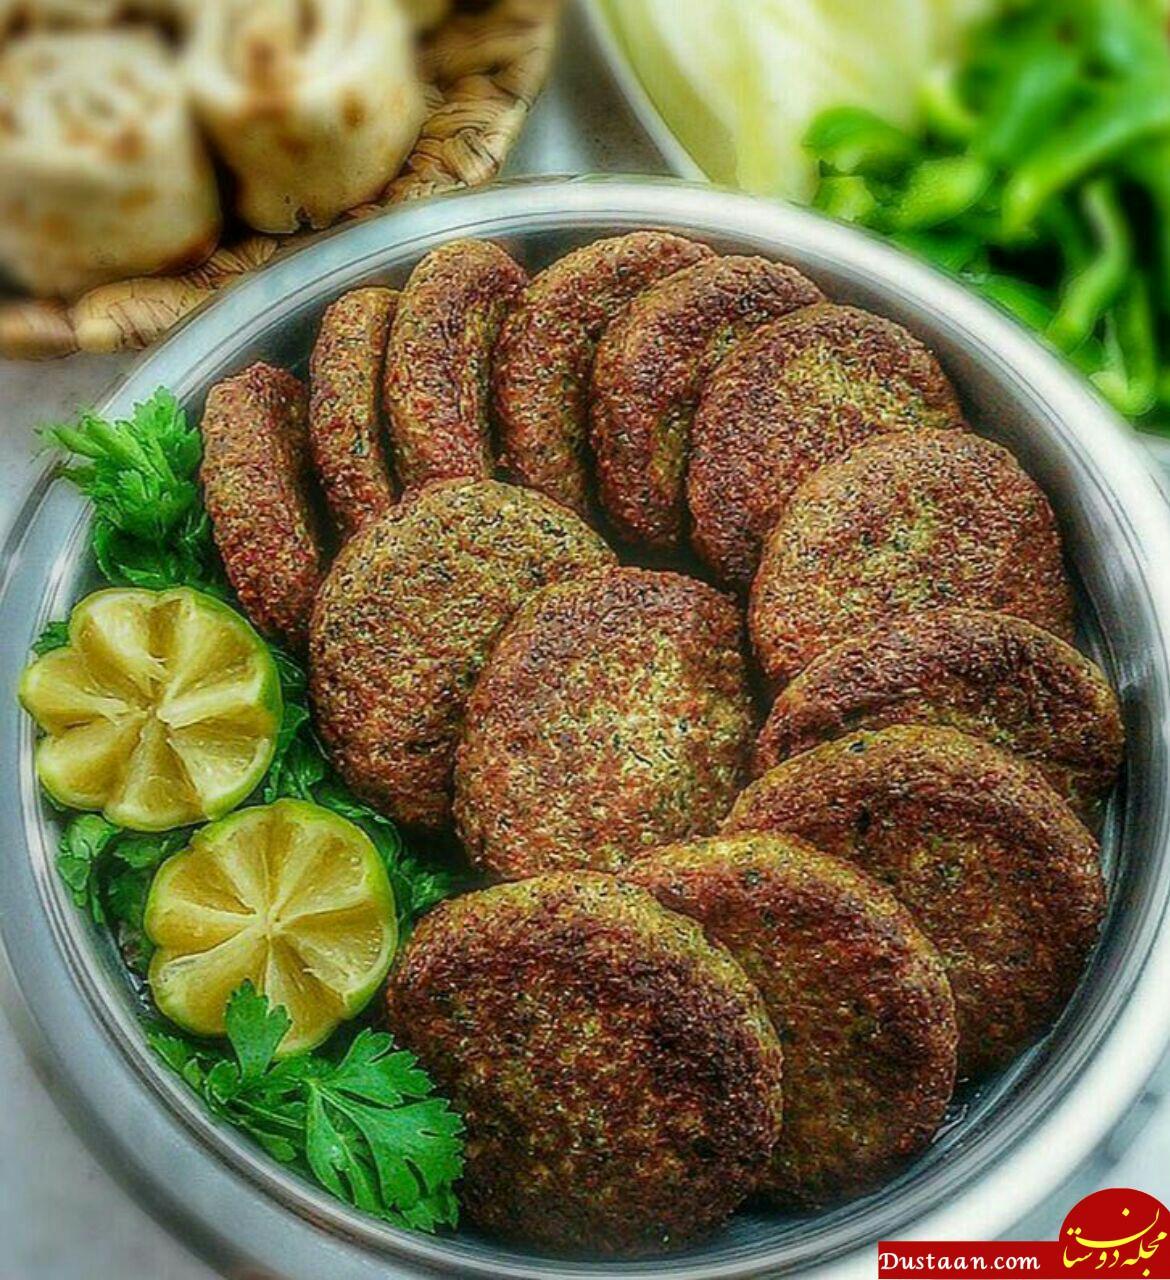 www.dustaan.com طرز تهیه شامی سویا به سبکی خوشمزه